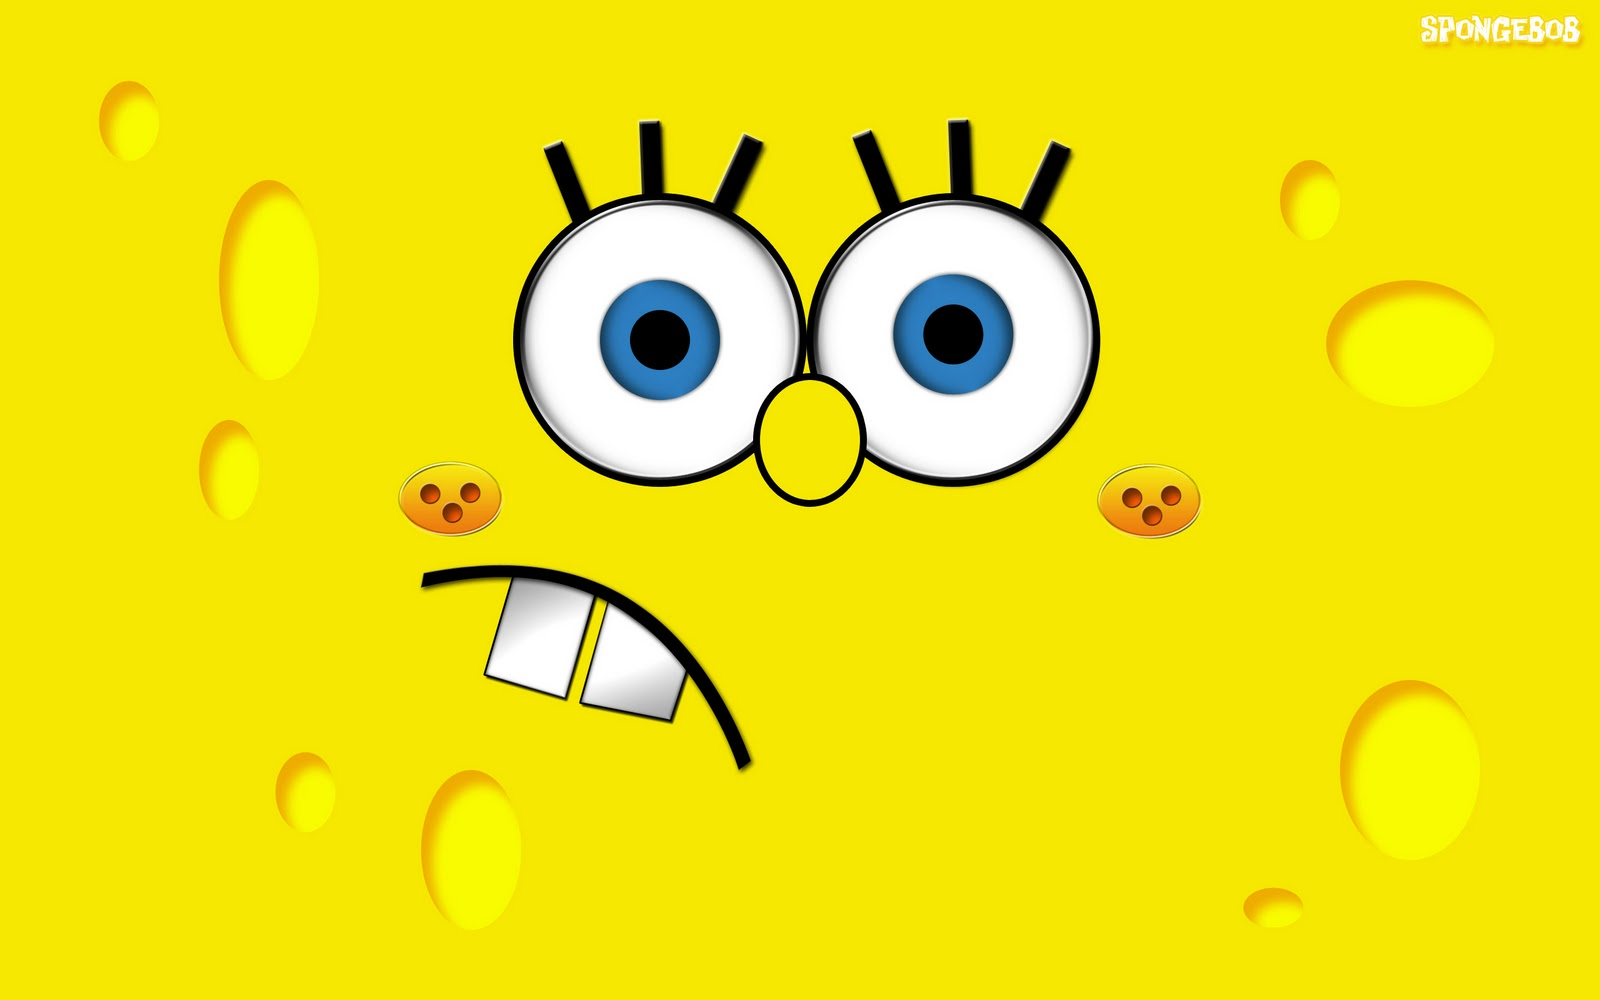 صور سبونج باب رووعة انتظر تفاعلكم  Sponge-bob-background-2560x1600-1006051